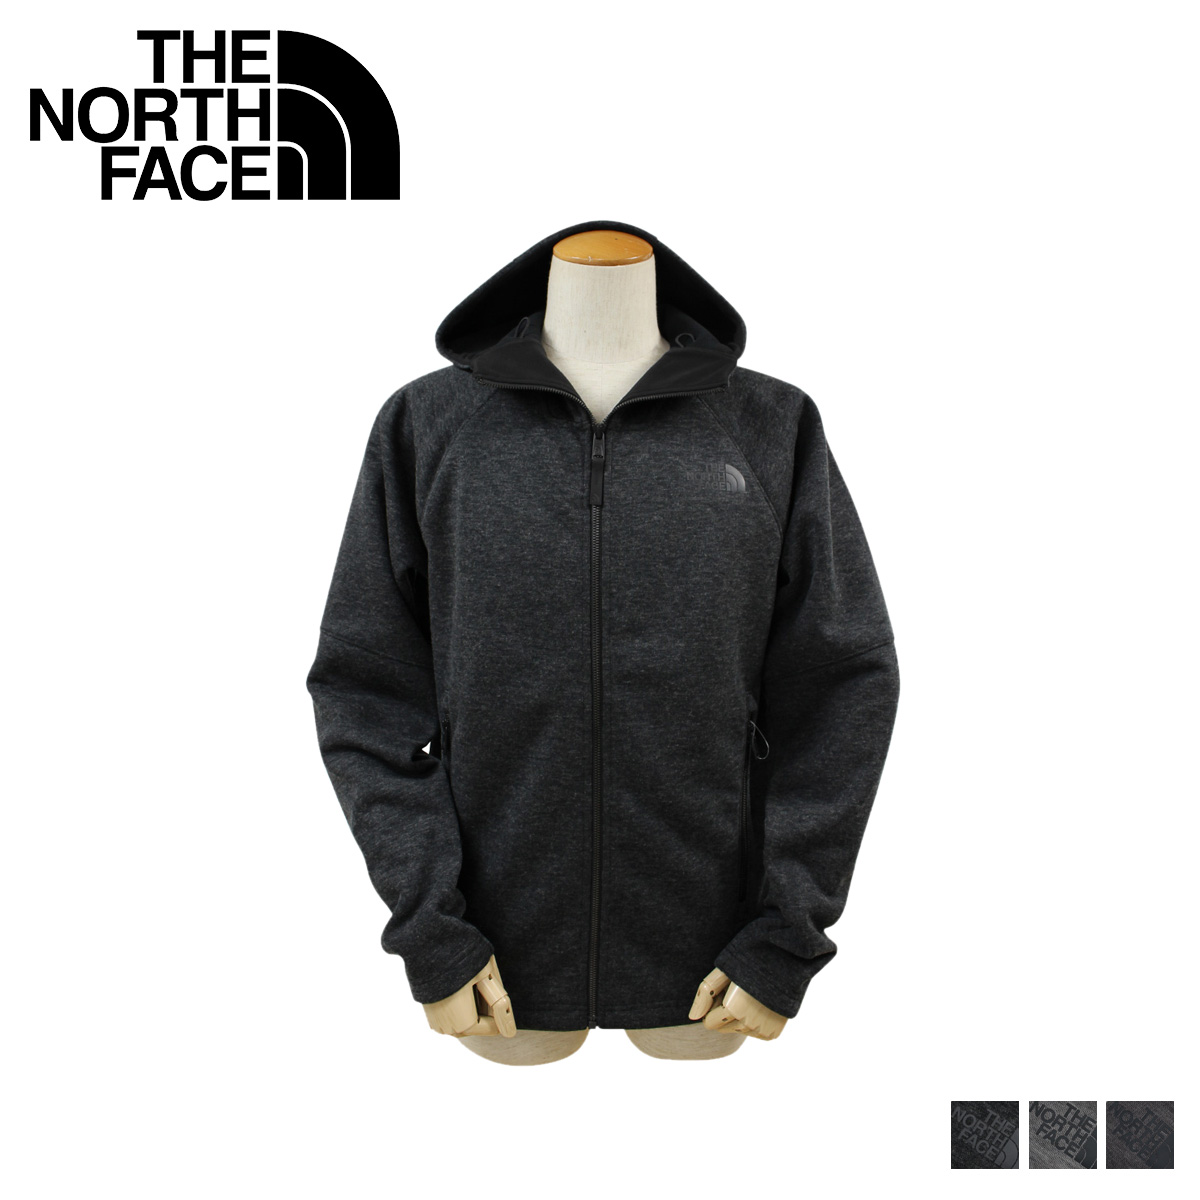 bcf077c49 THE NORTH FACE North Face jacket parka fleece parka MEN'S FAR NORTHERN  HOODIE NF0A2TBD men